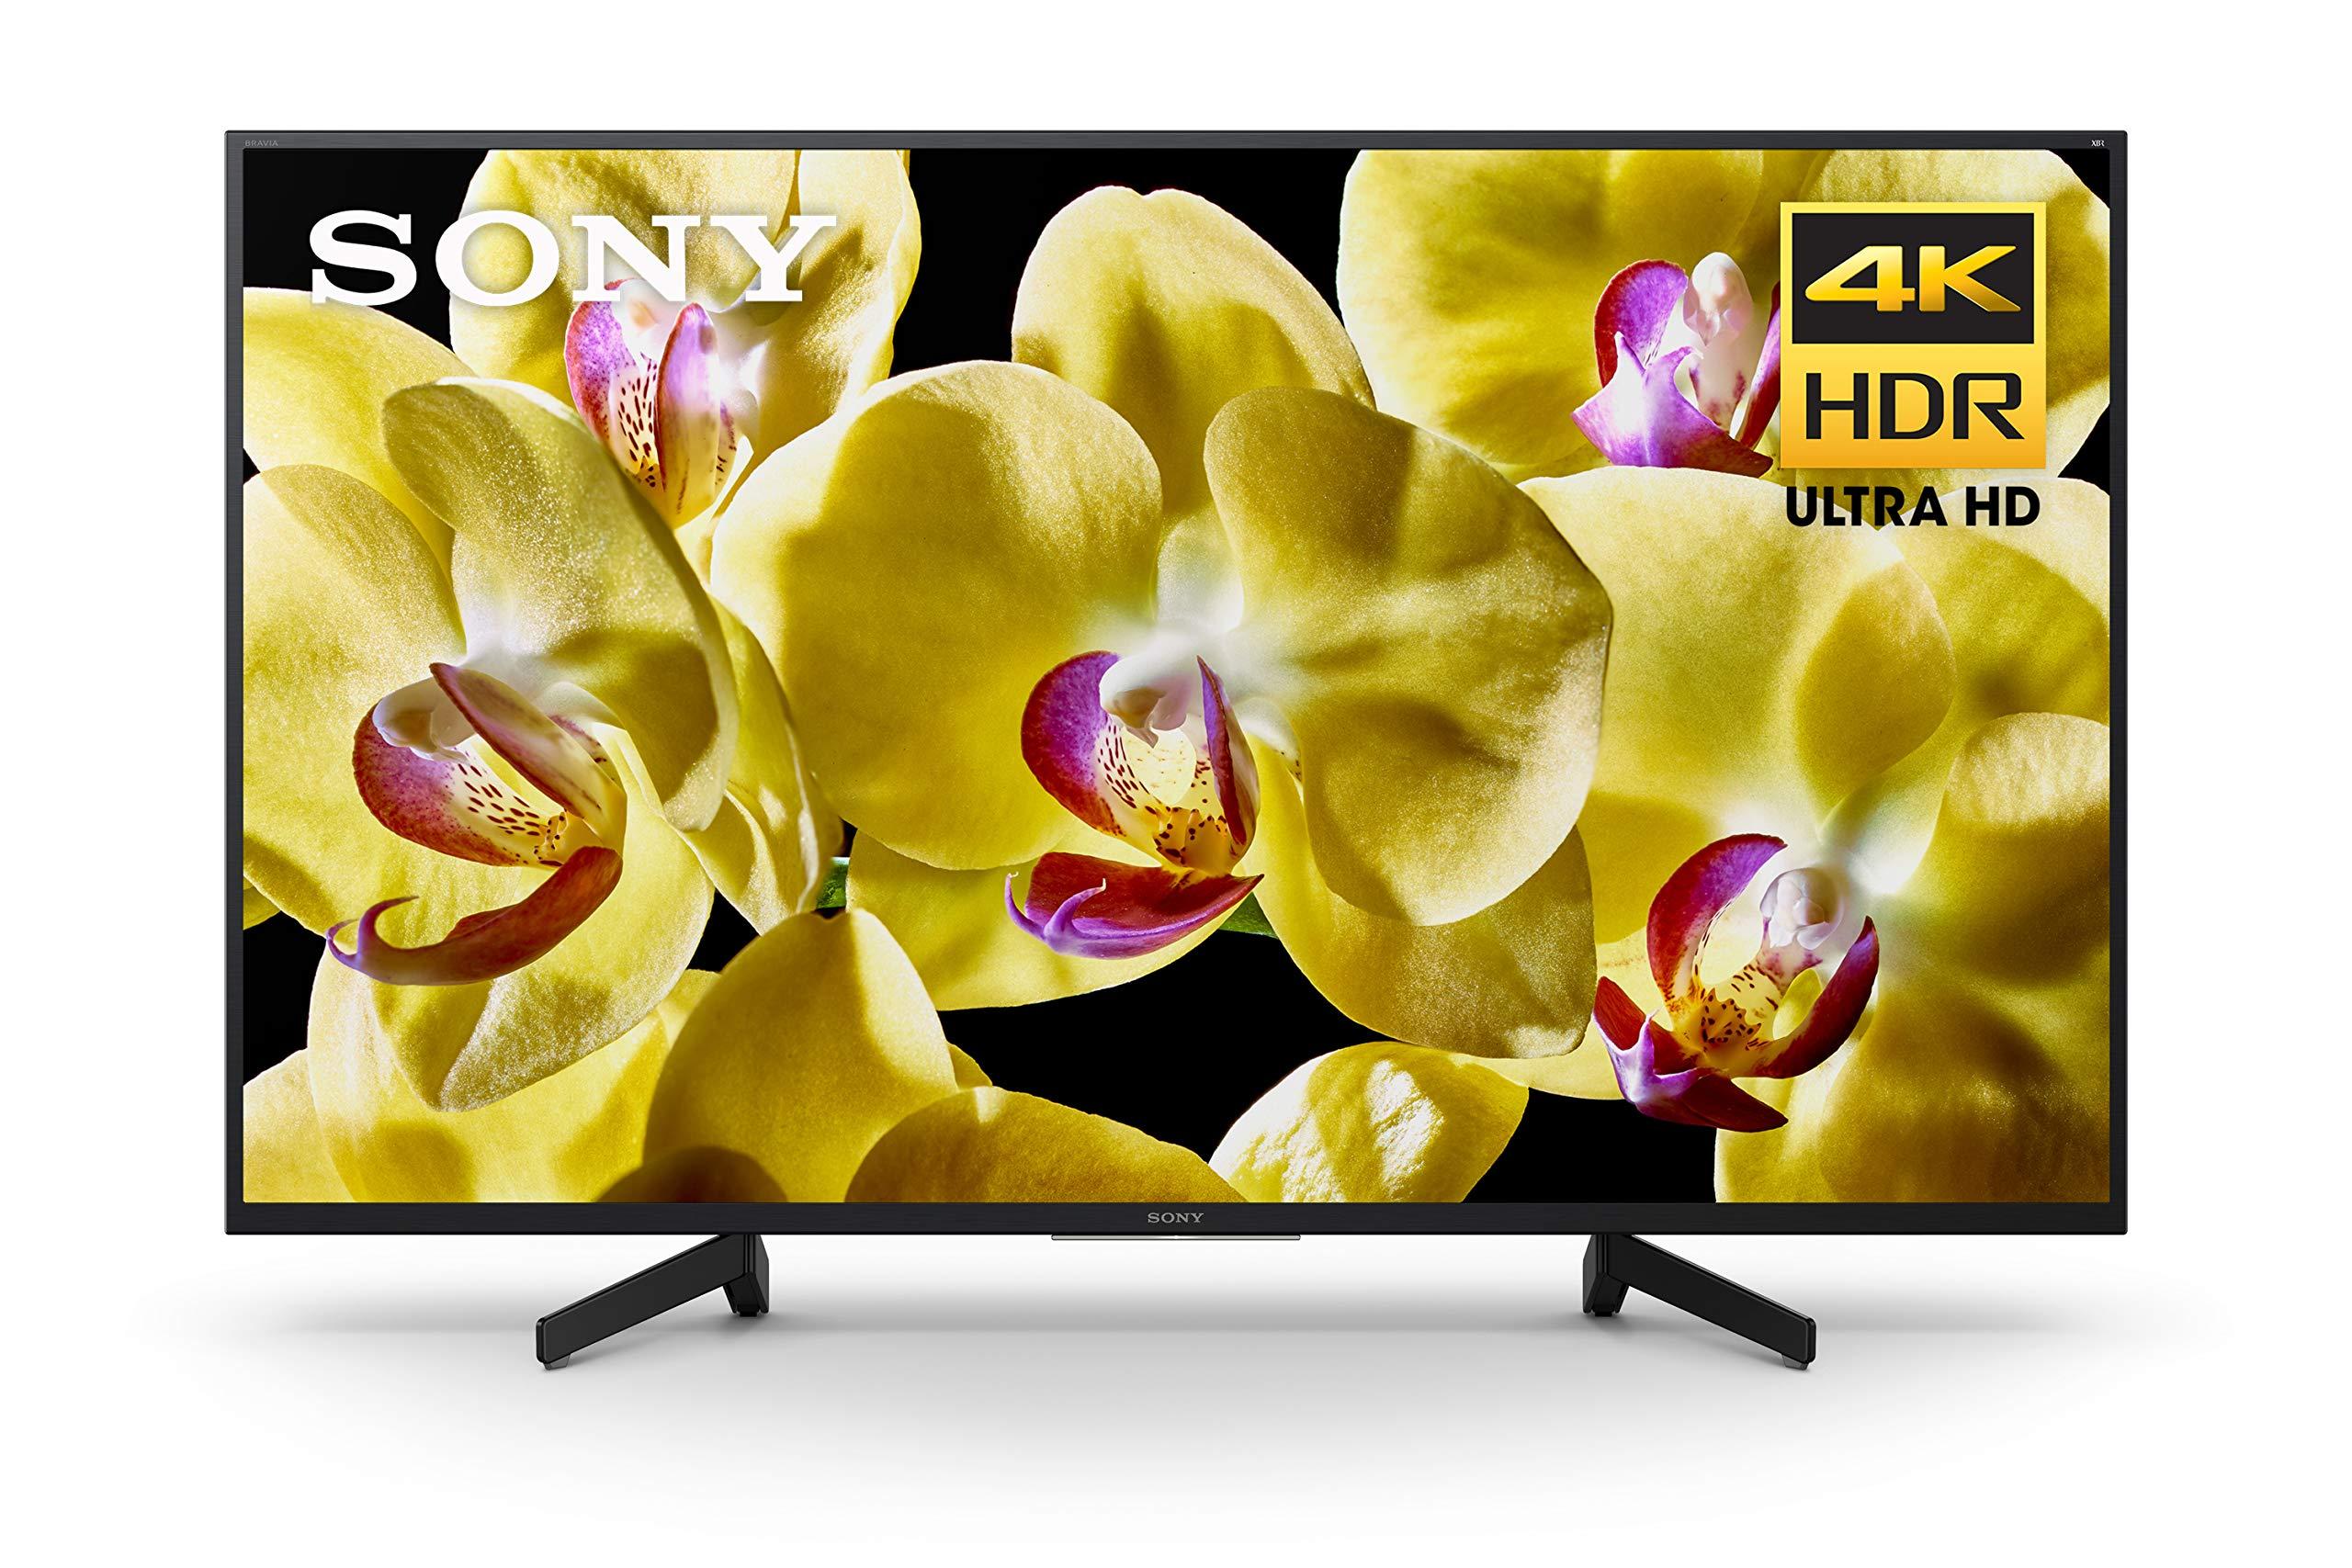 Sony XBR-49X800G 49-Inch 4K Ultra HD LED TV (2019 Model)